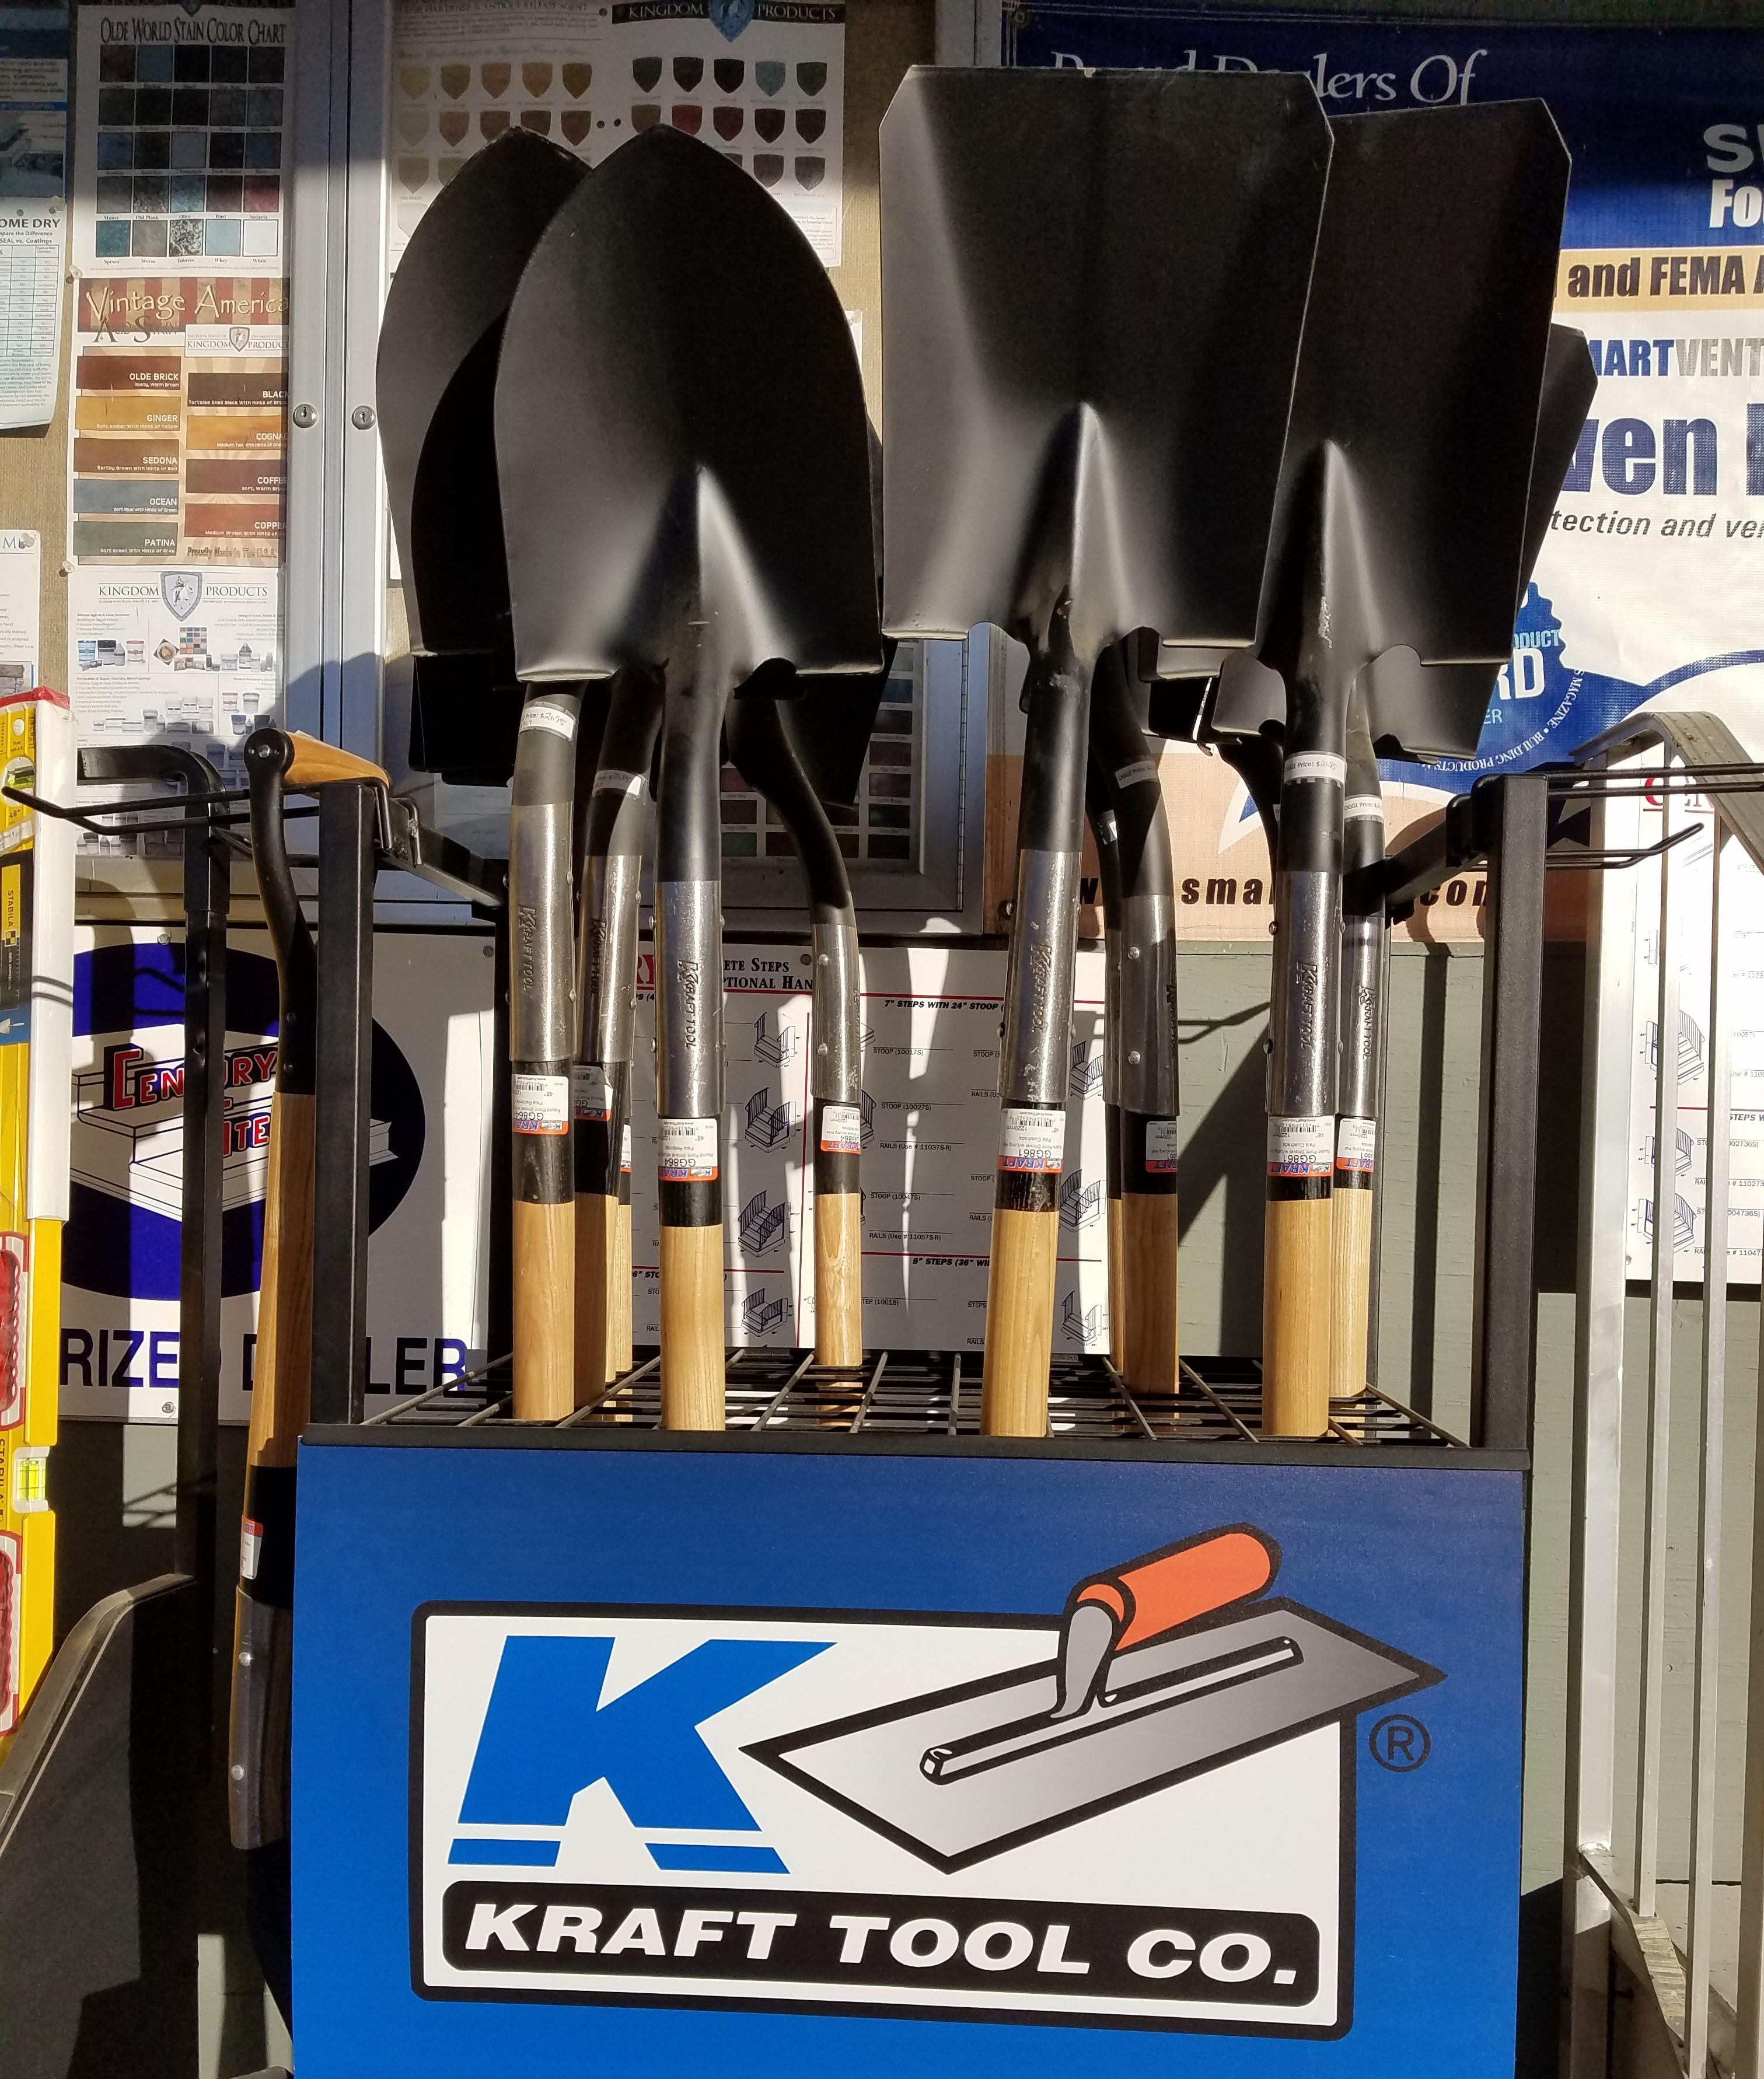 Kraft Shovel Pic (2)